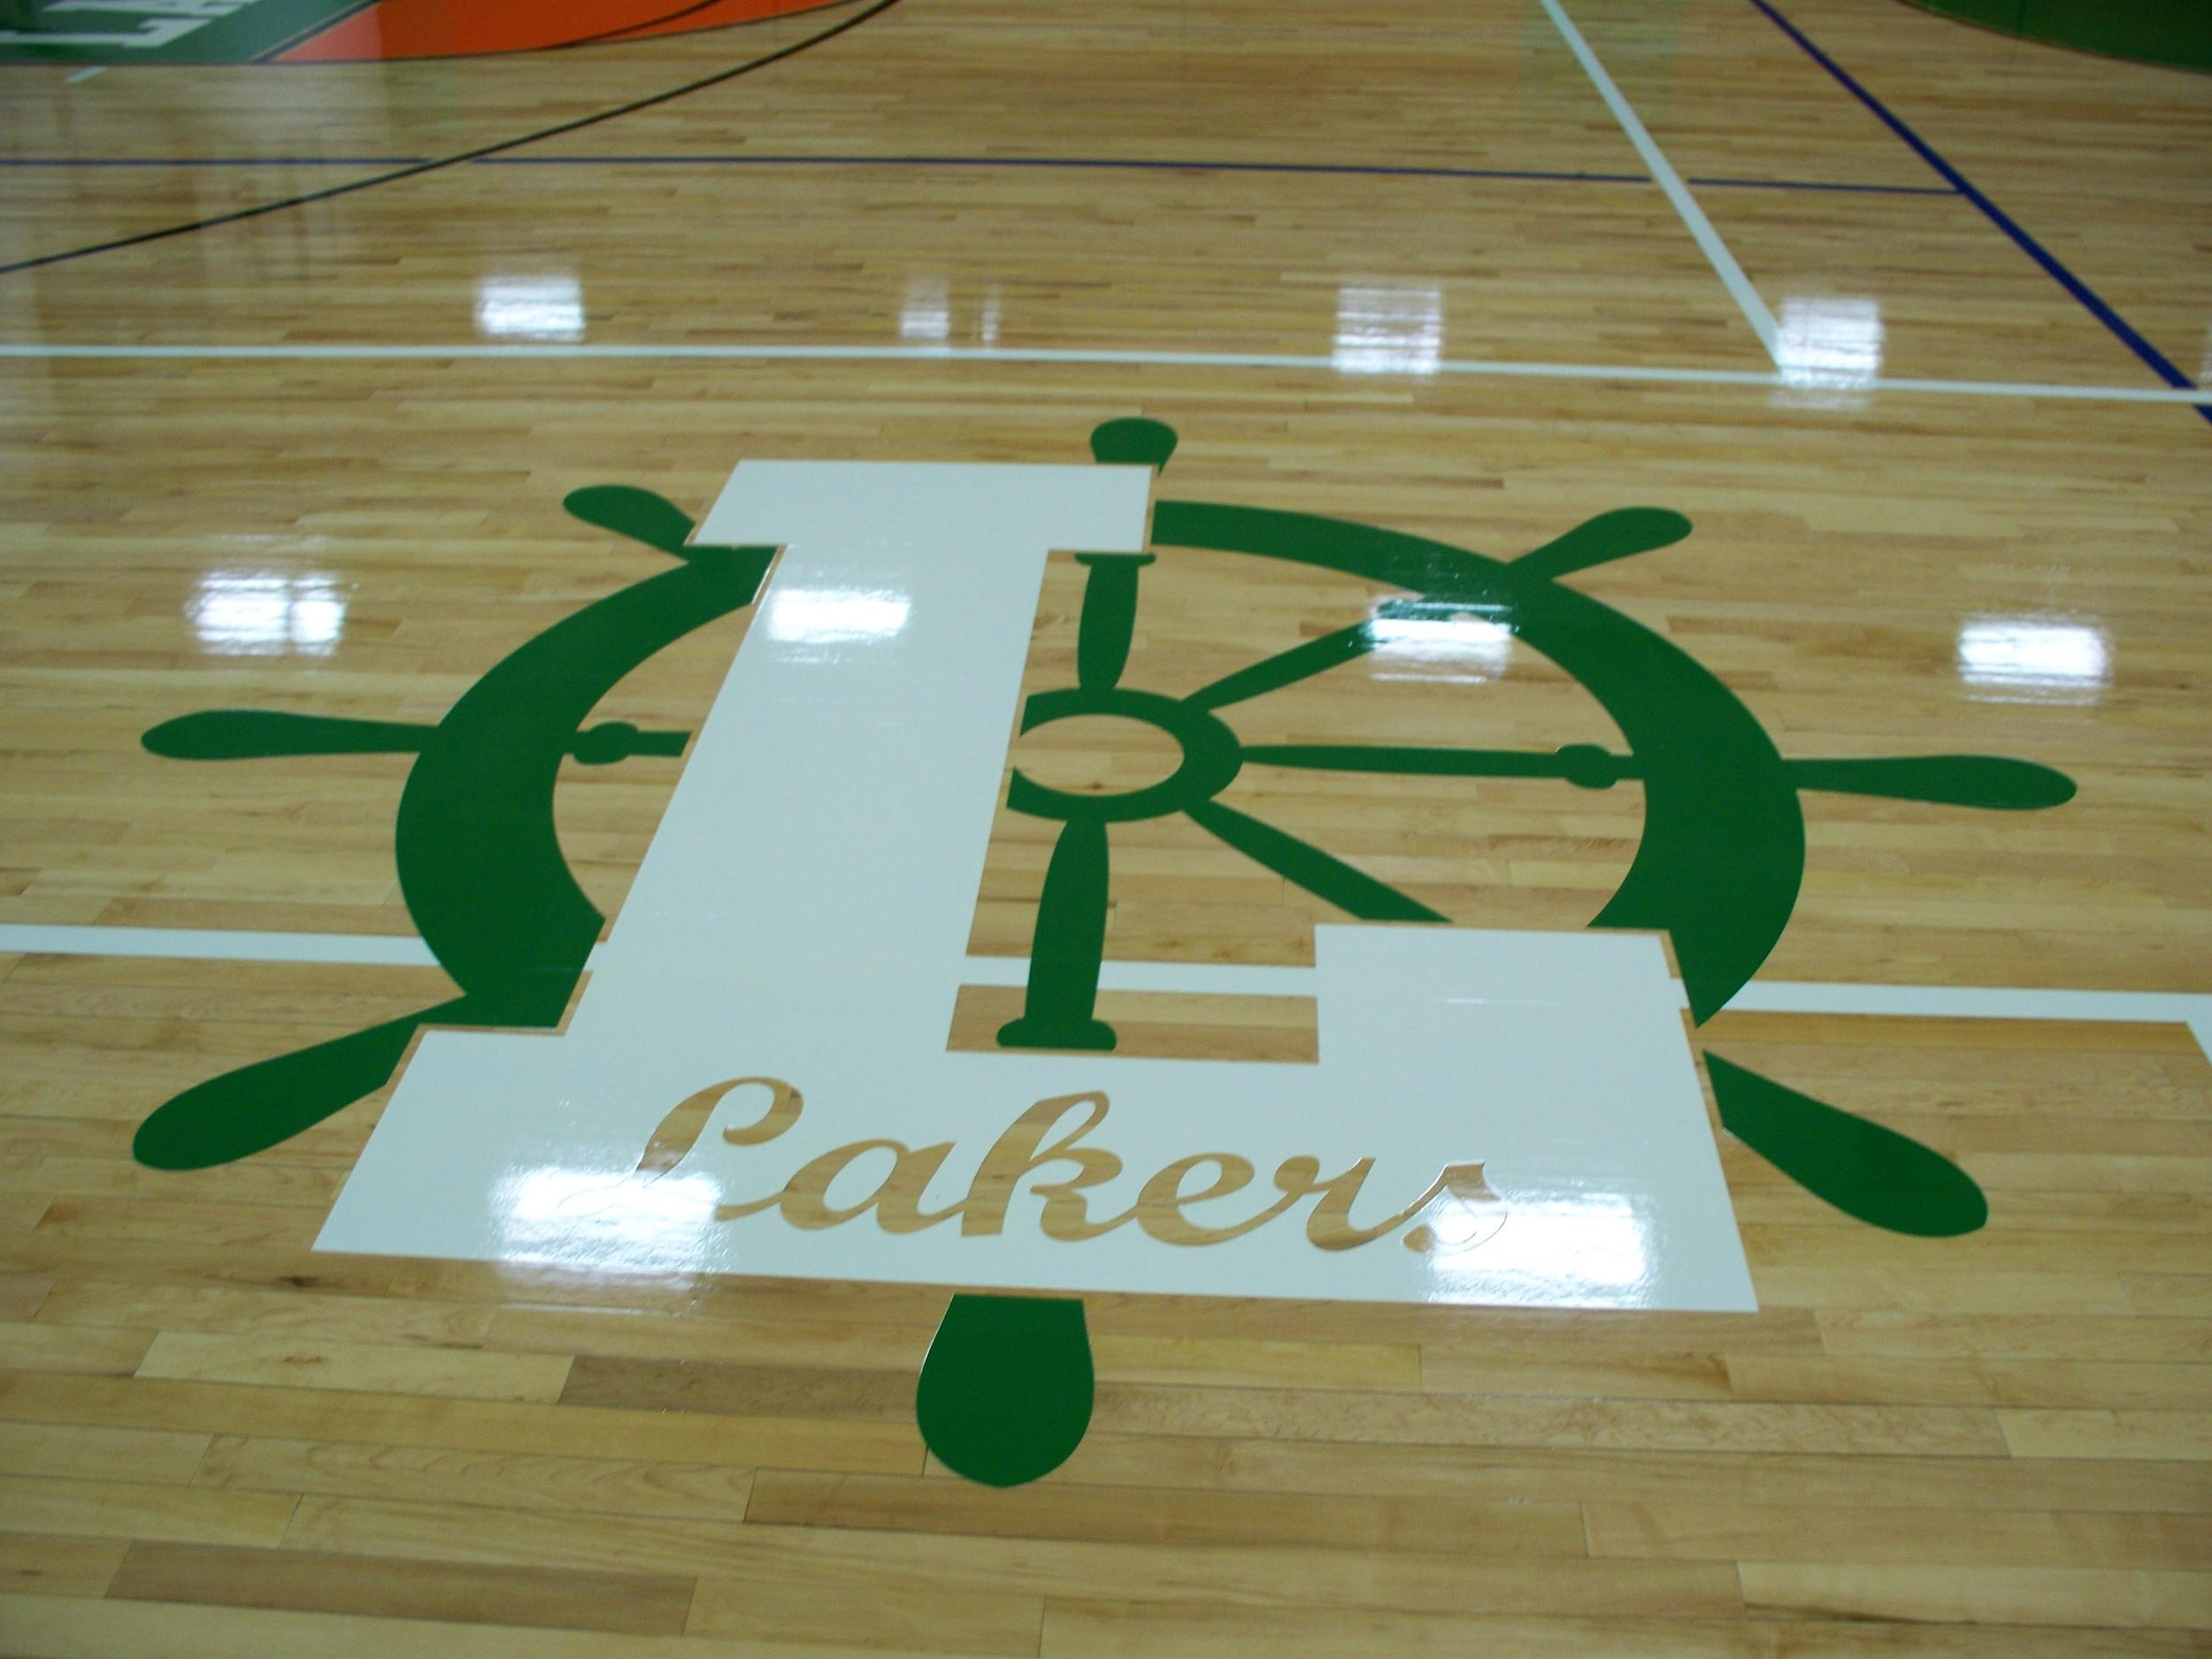 laker school floor.jpg